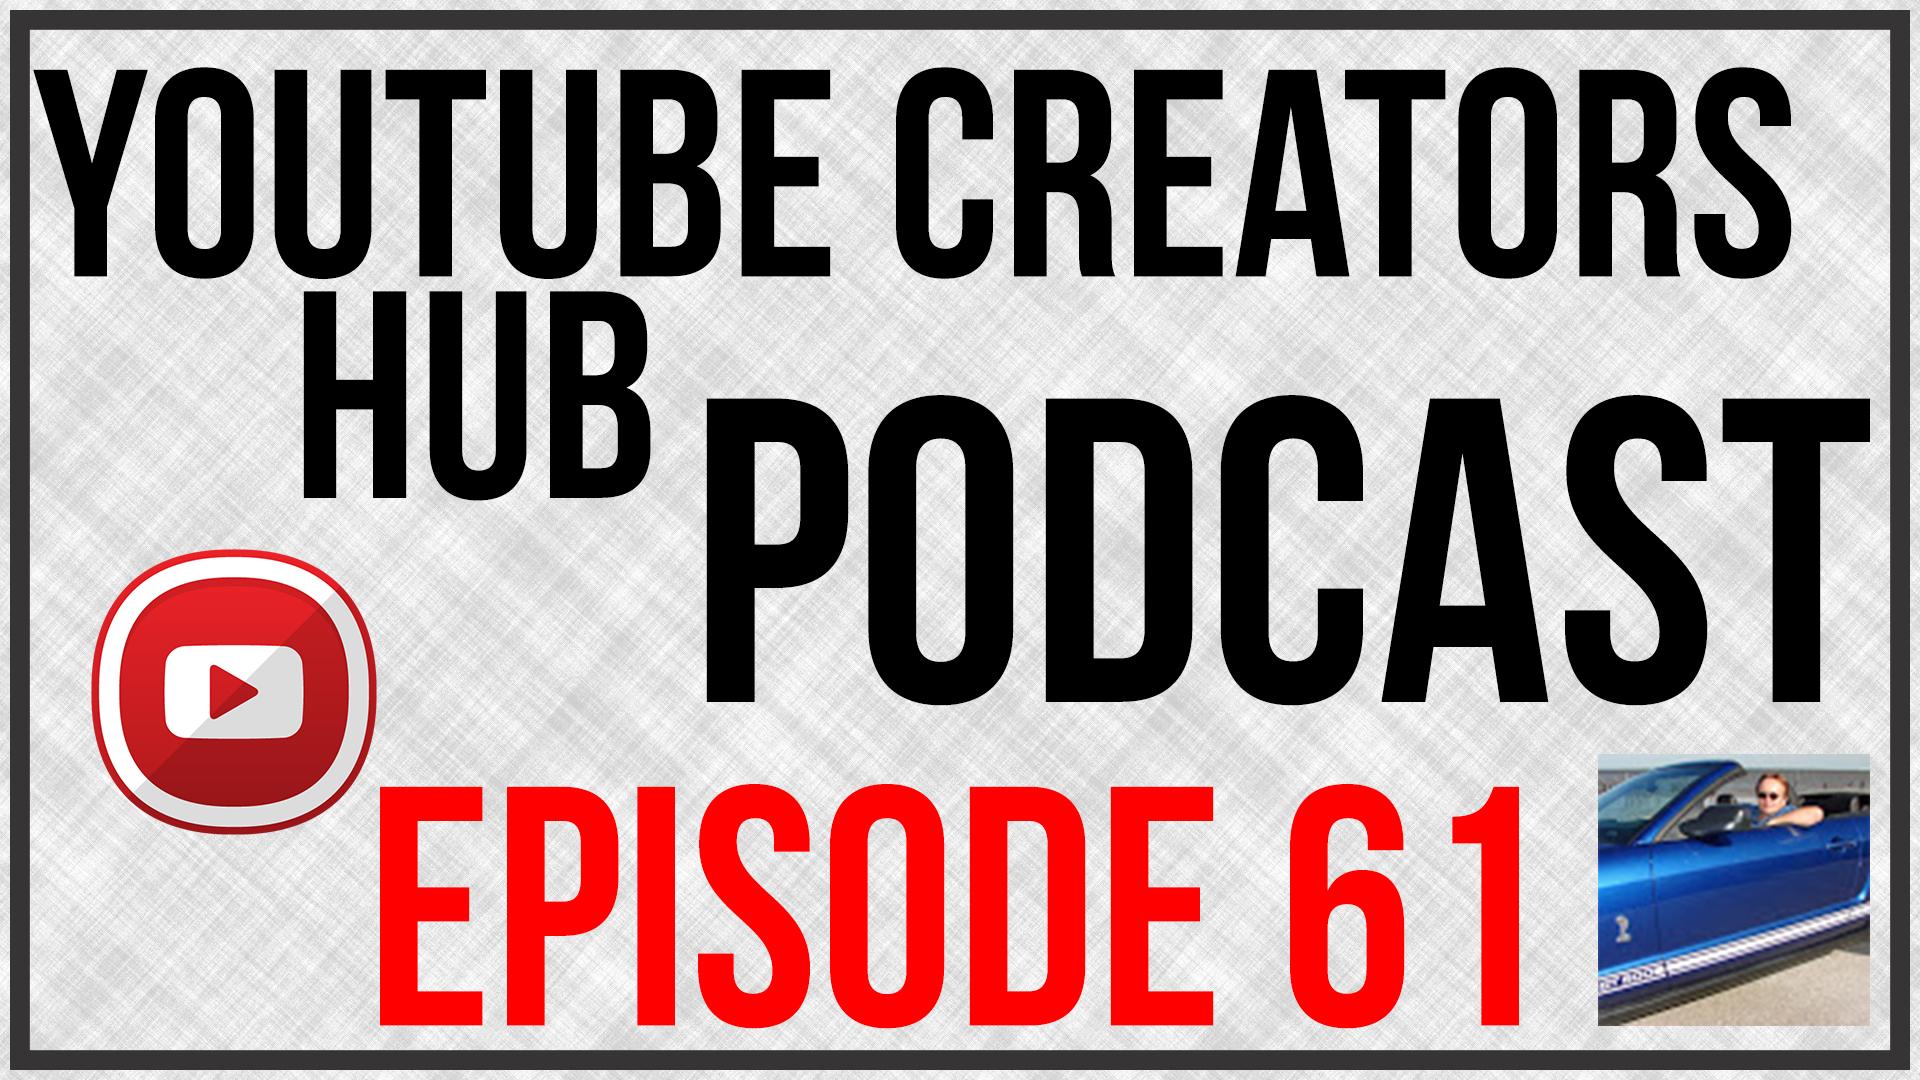 YouTube Creators Hub Podcast Episode 61